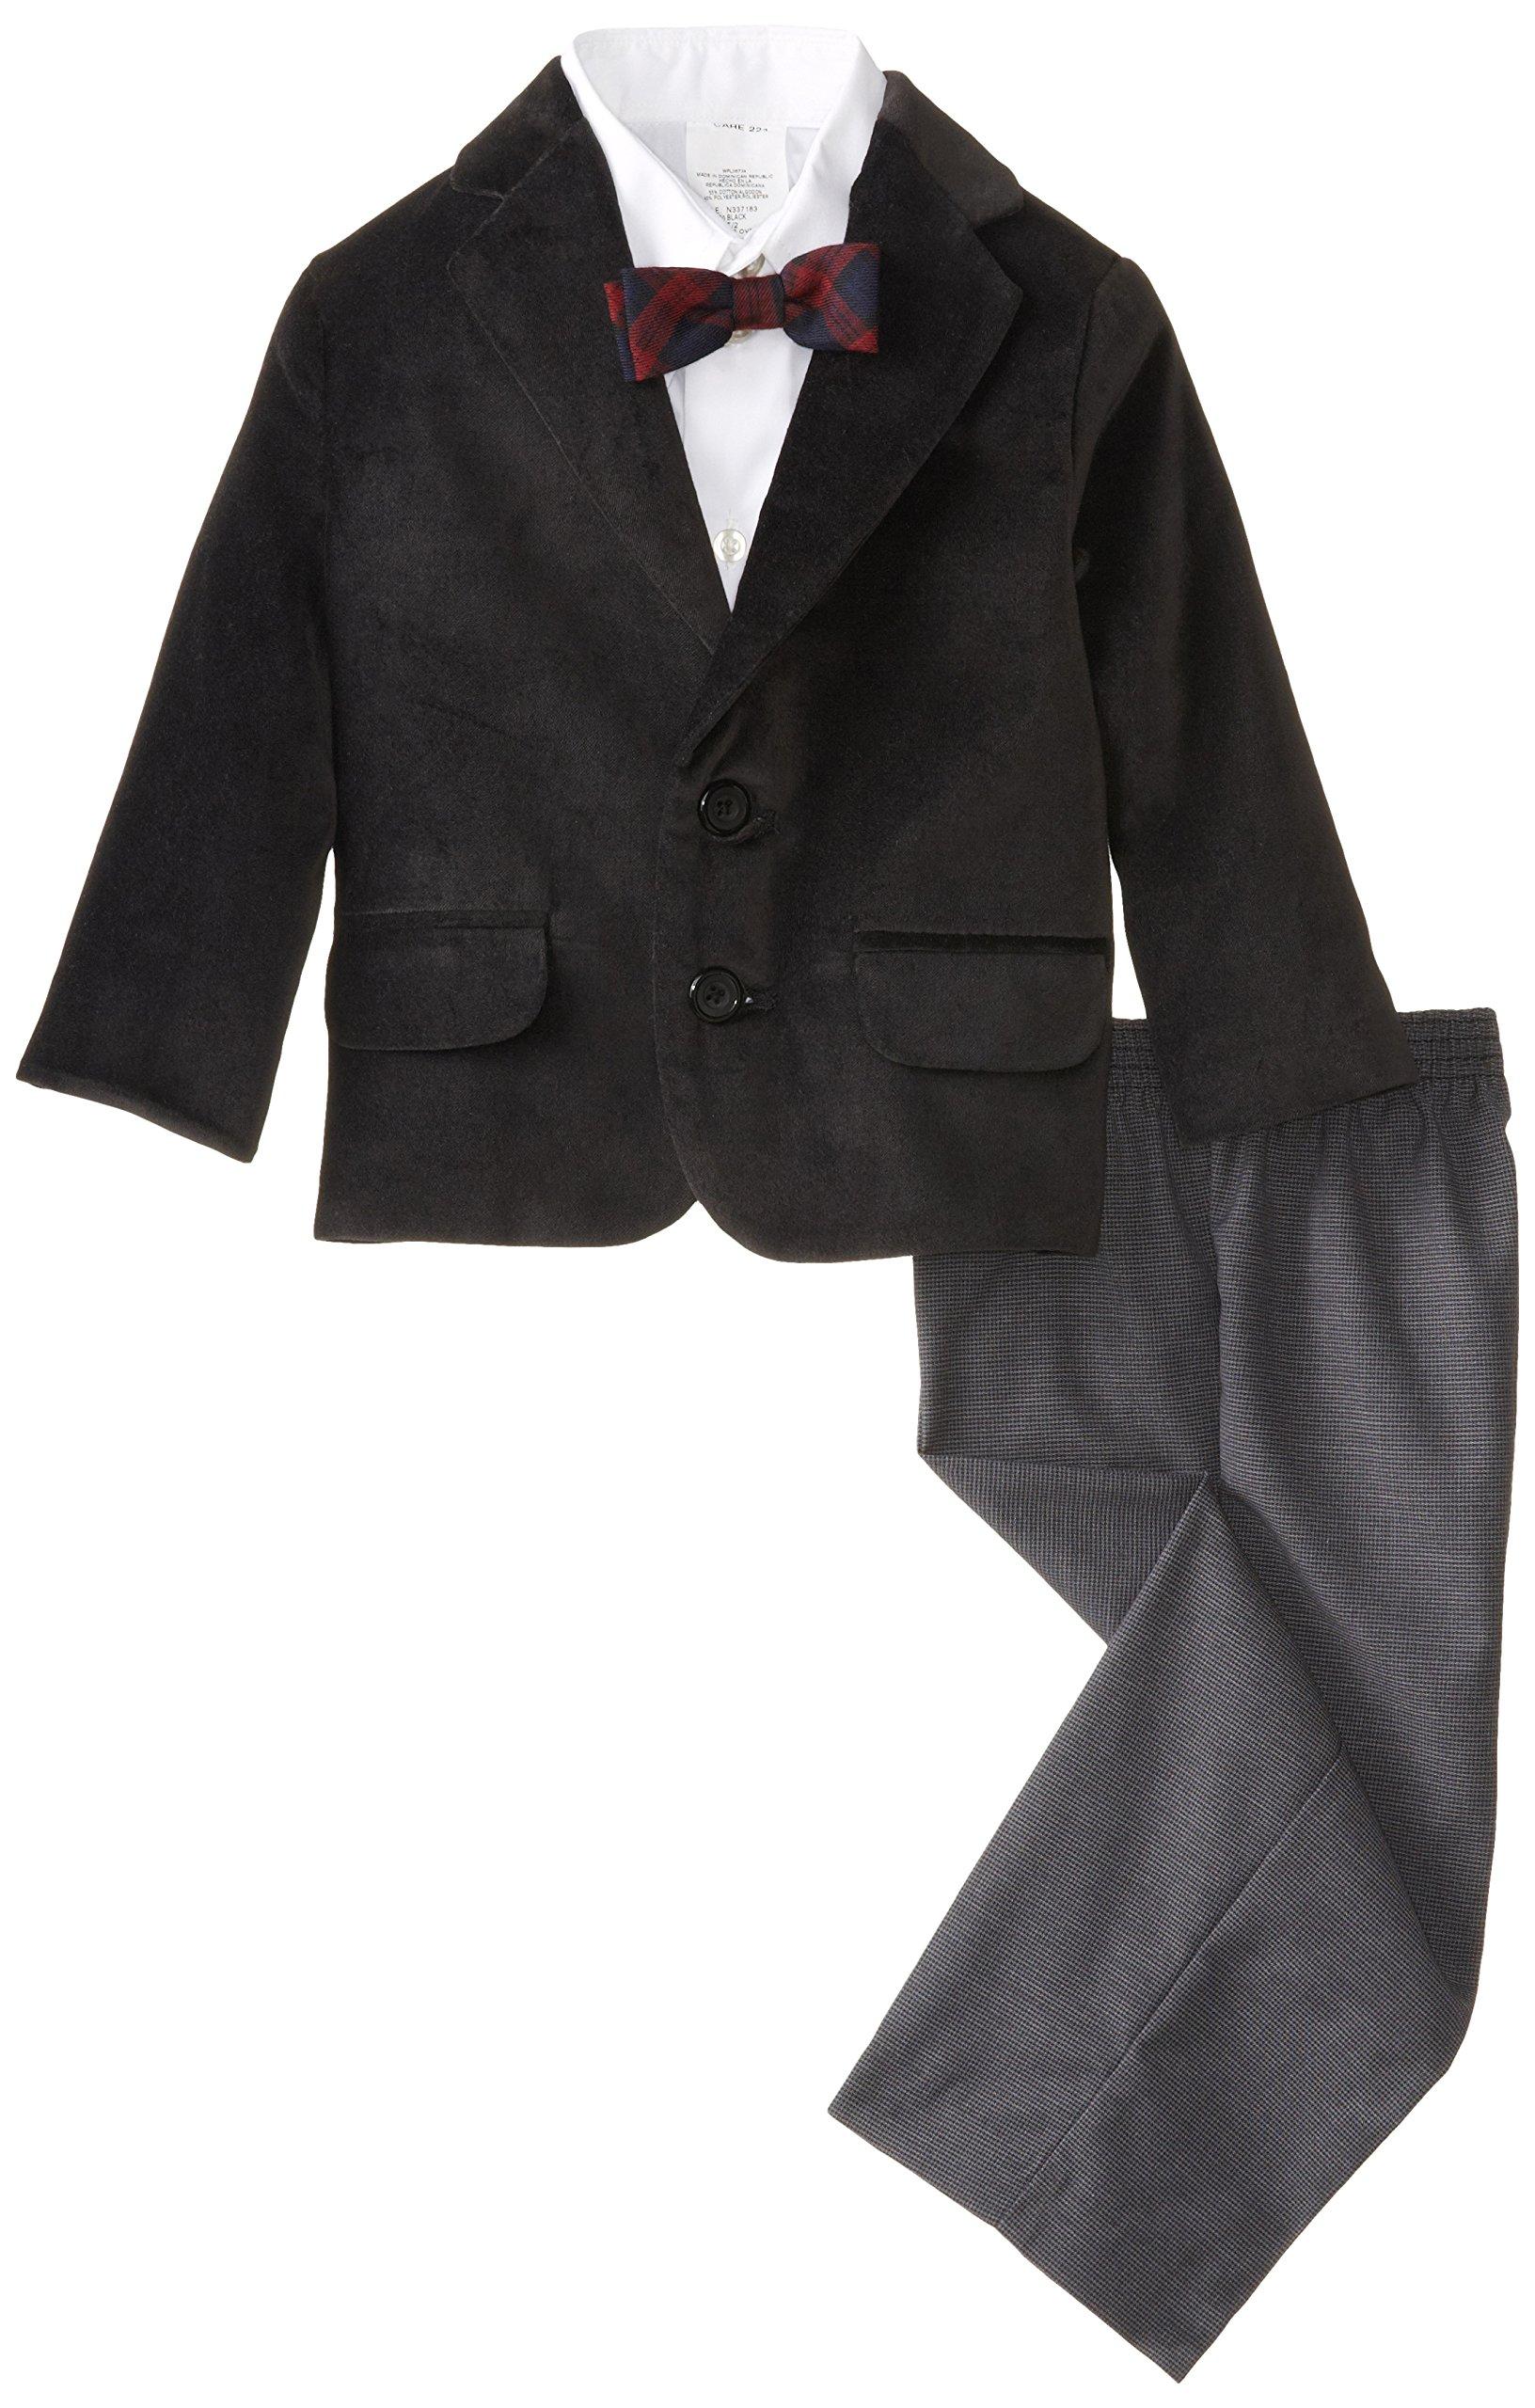 Nautica Little Boys' Velvet Suit Set, Black, 5